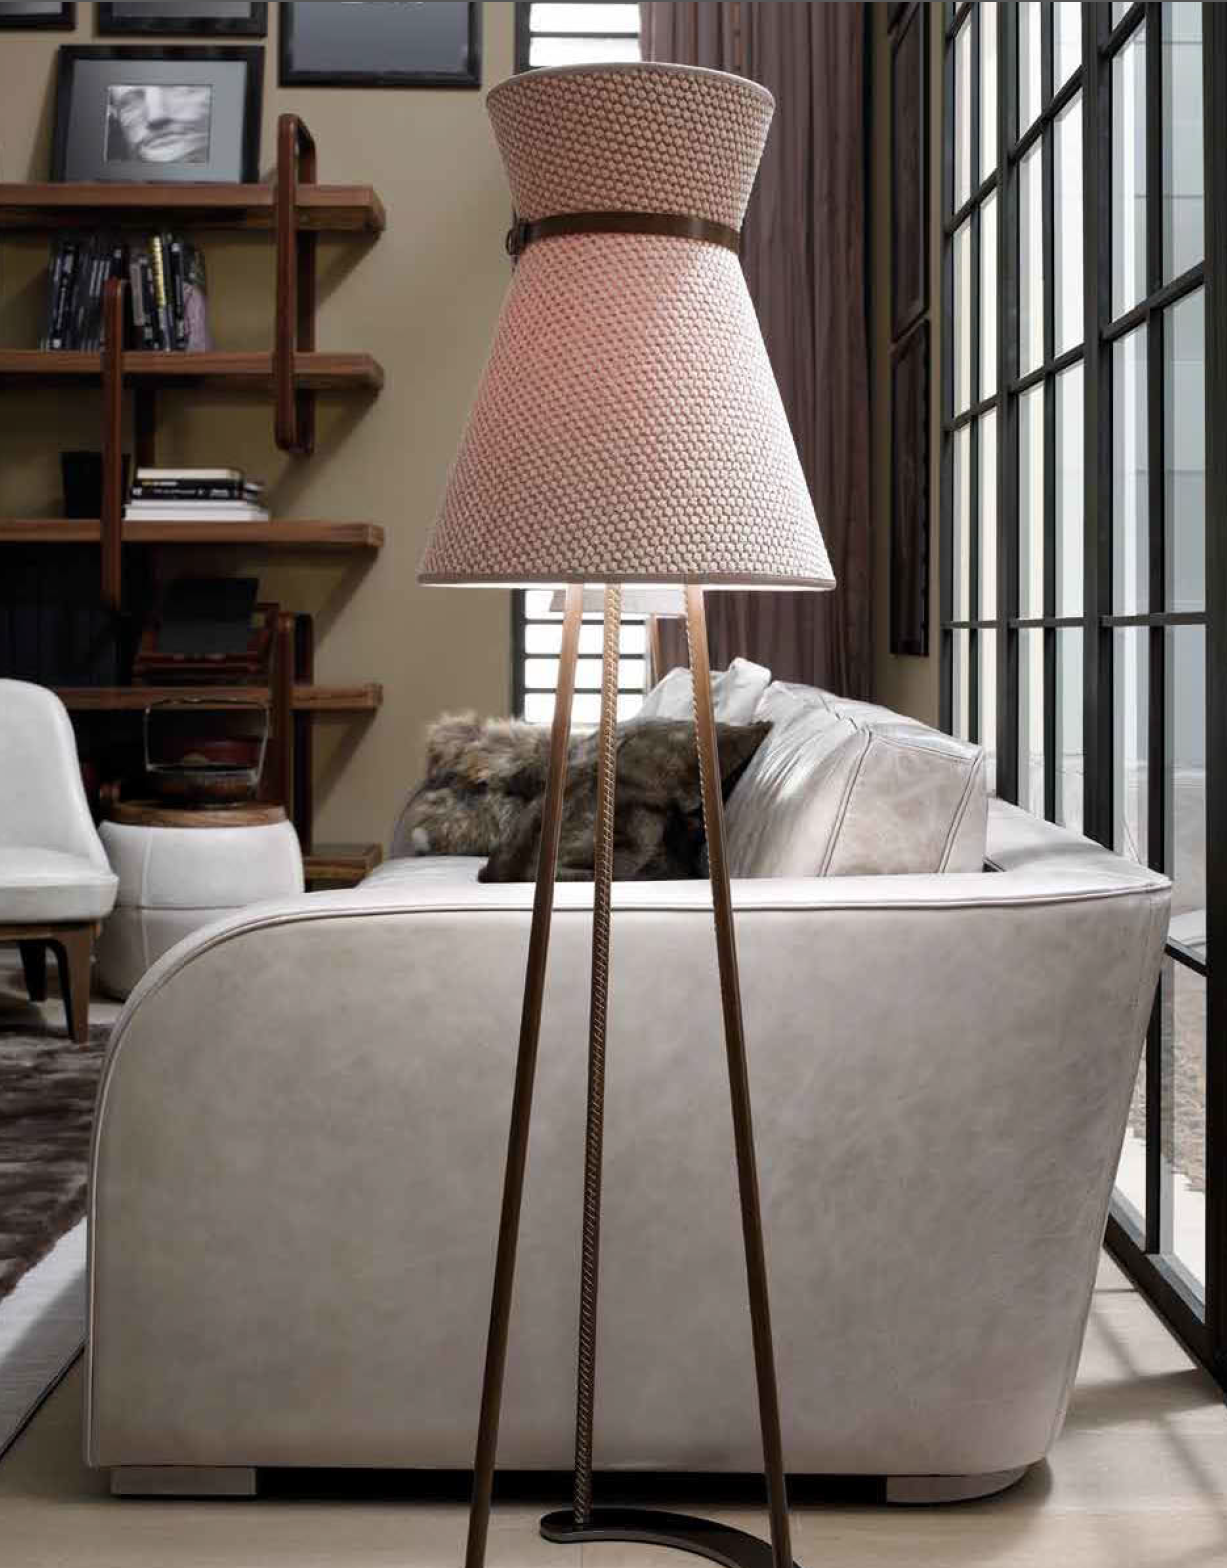 Ulivi Salotti Mademoiselle floor lamp - An Ode to Leathers @ Masha Shapiro Agency.jpg